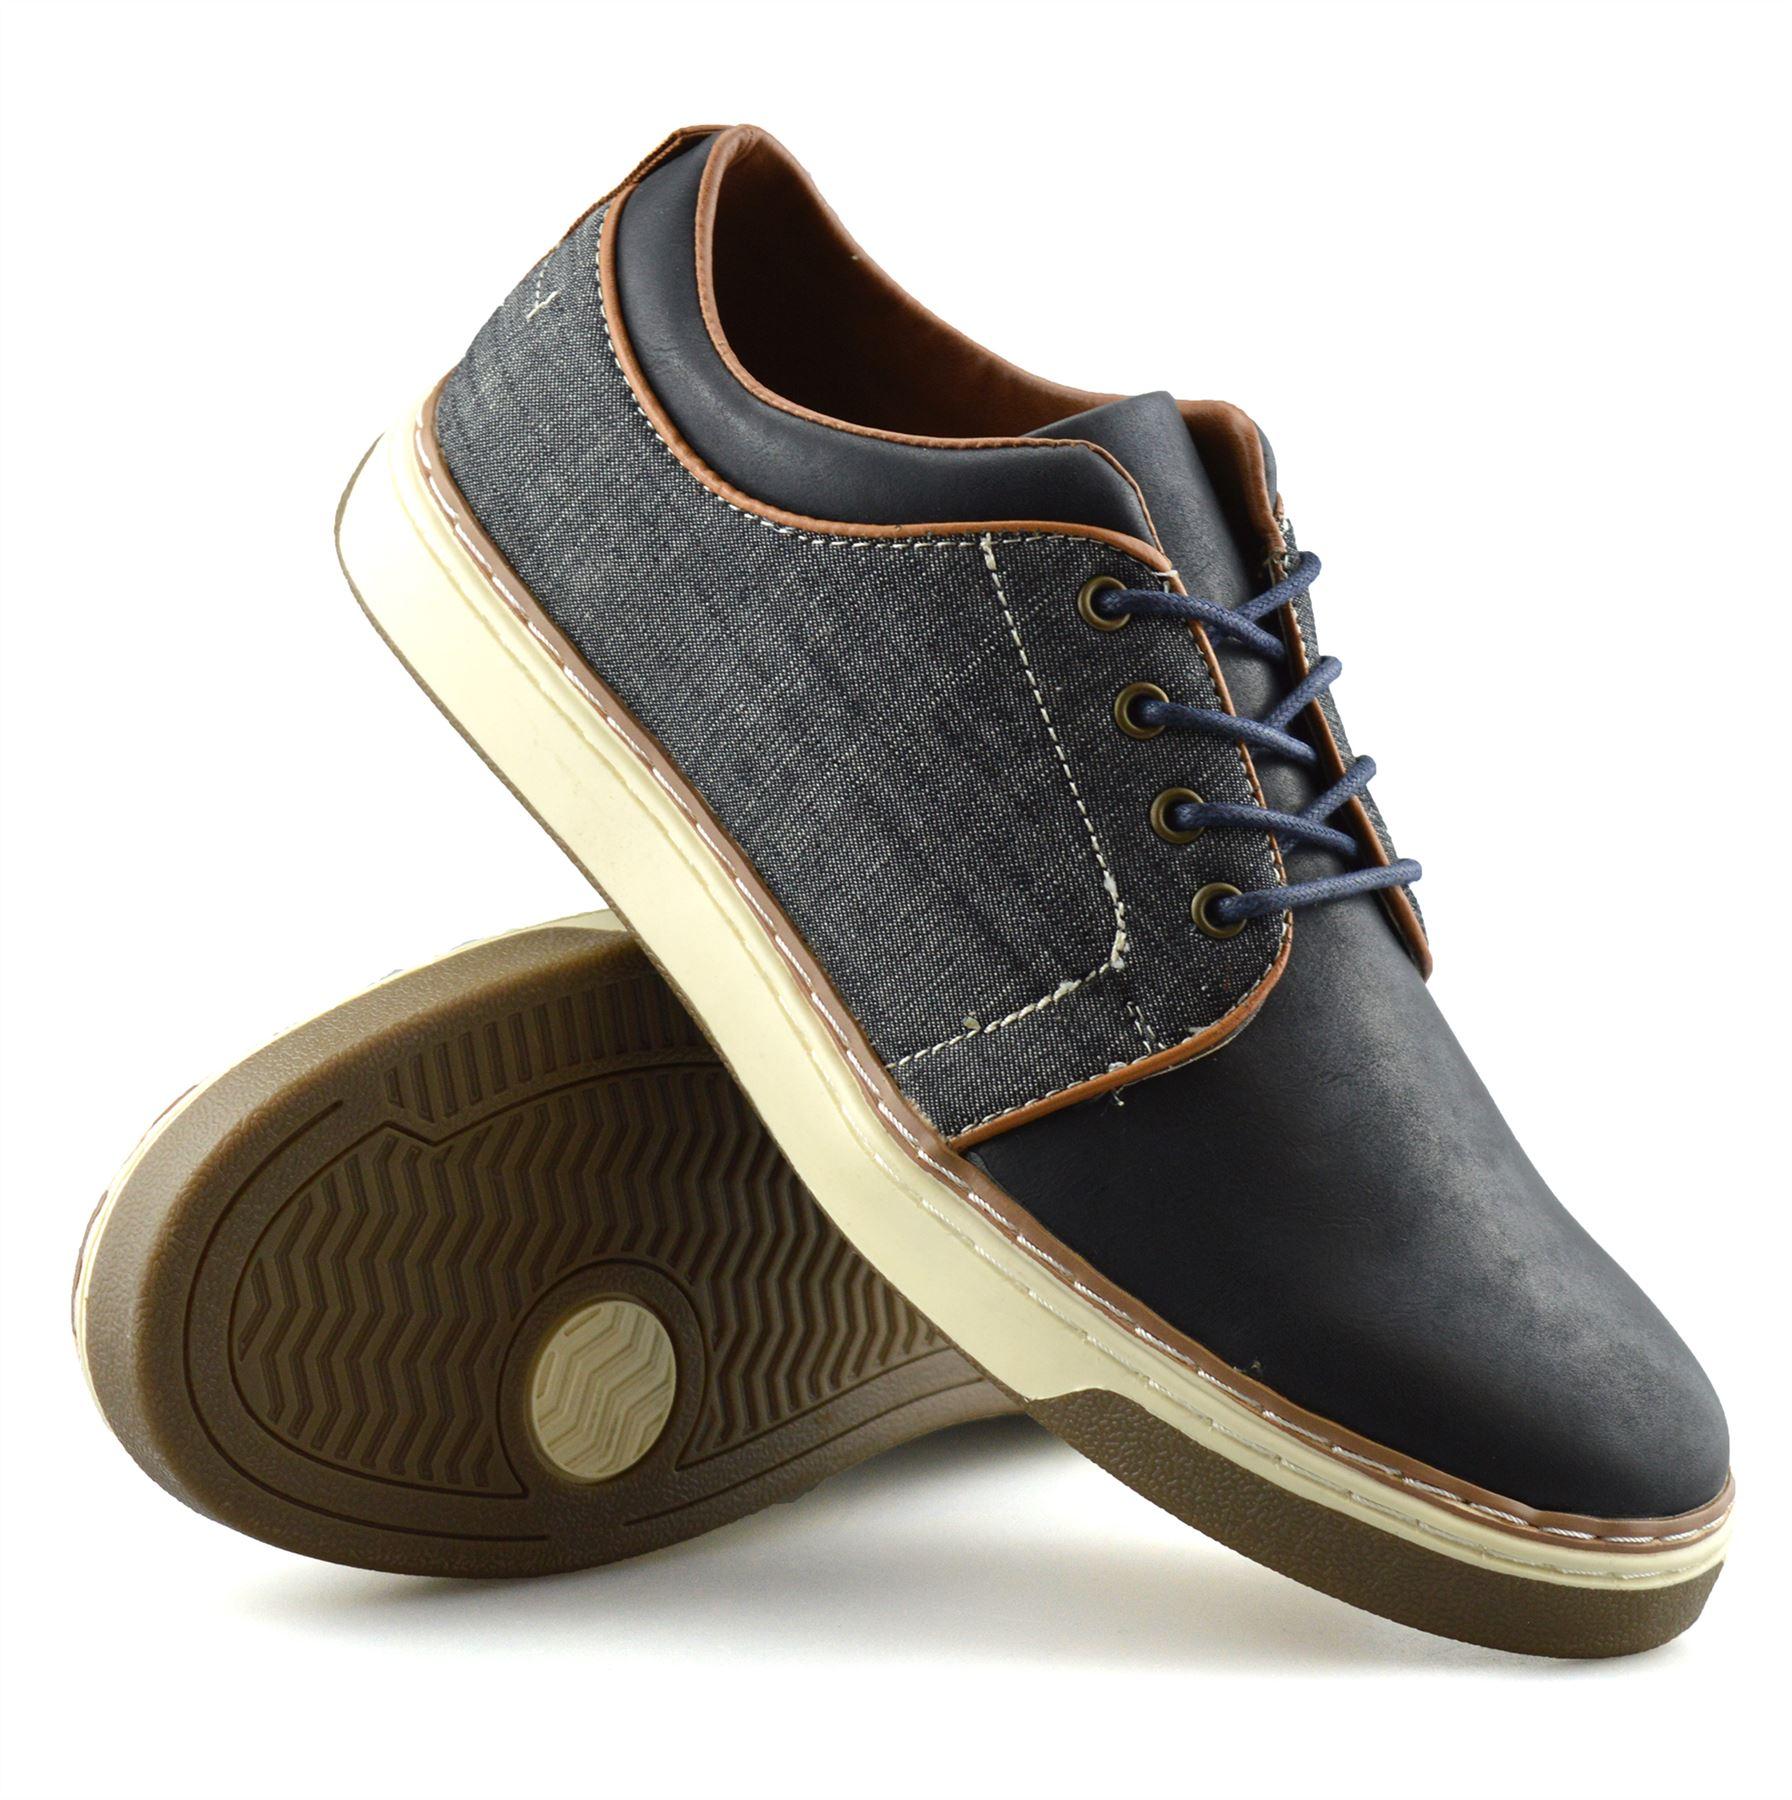 Homme-Nouveau-Casual-Smart-bateau-pont-Mocassin-Walking-Driving-Work-Lace-Up-Chaussures-Taille miniature 17